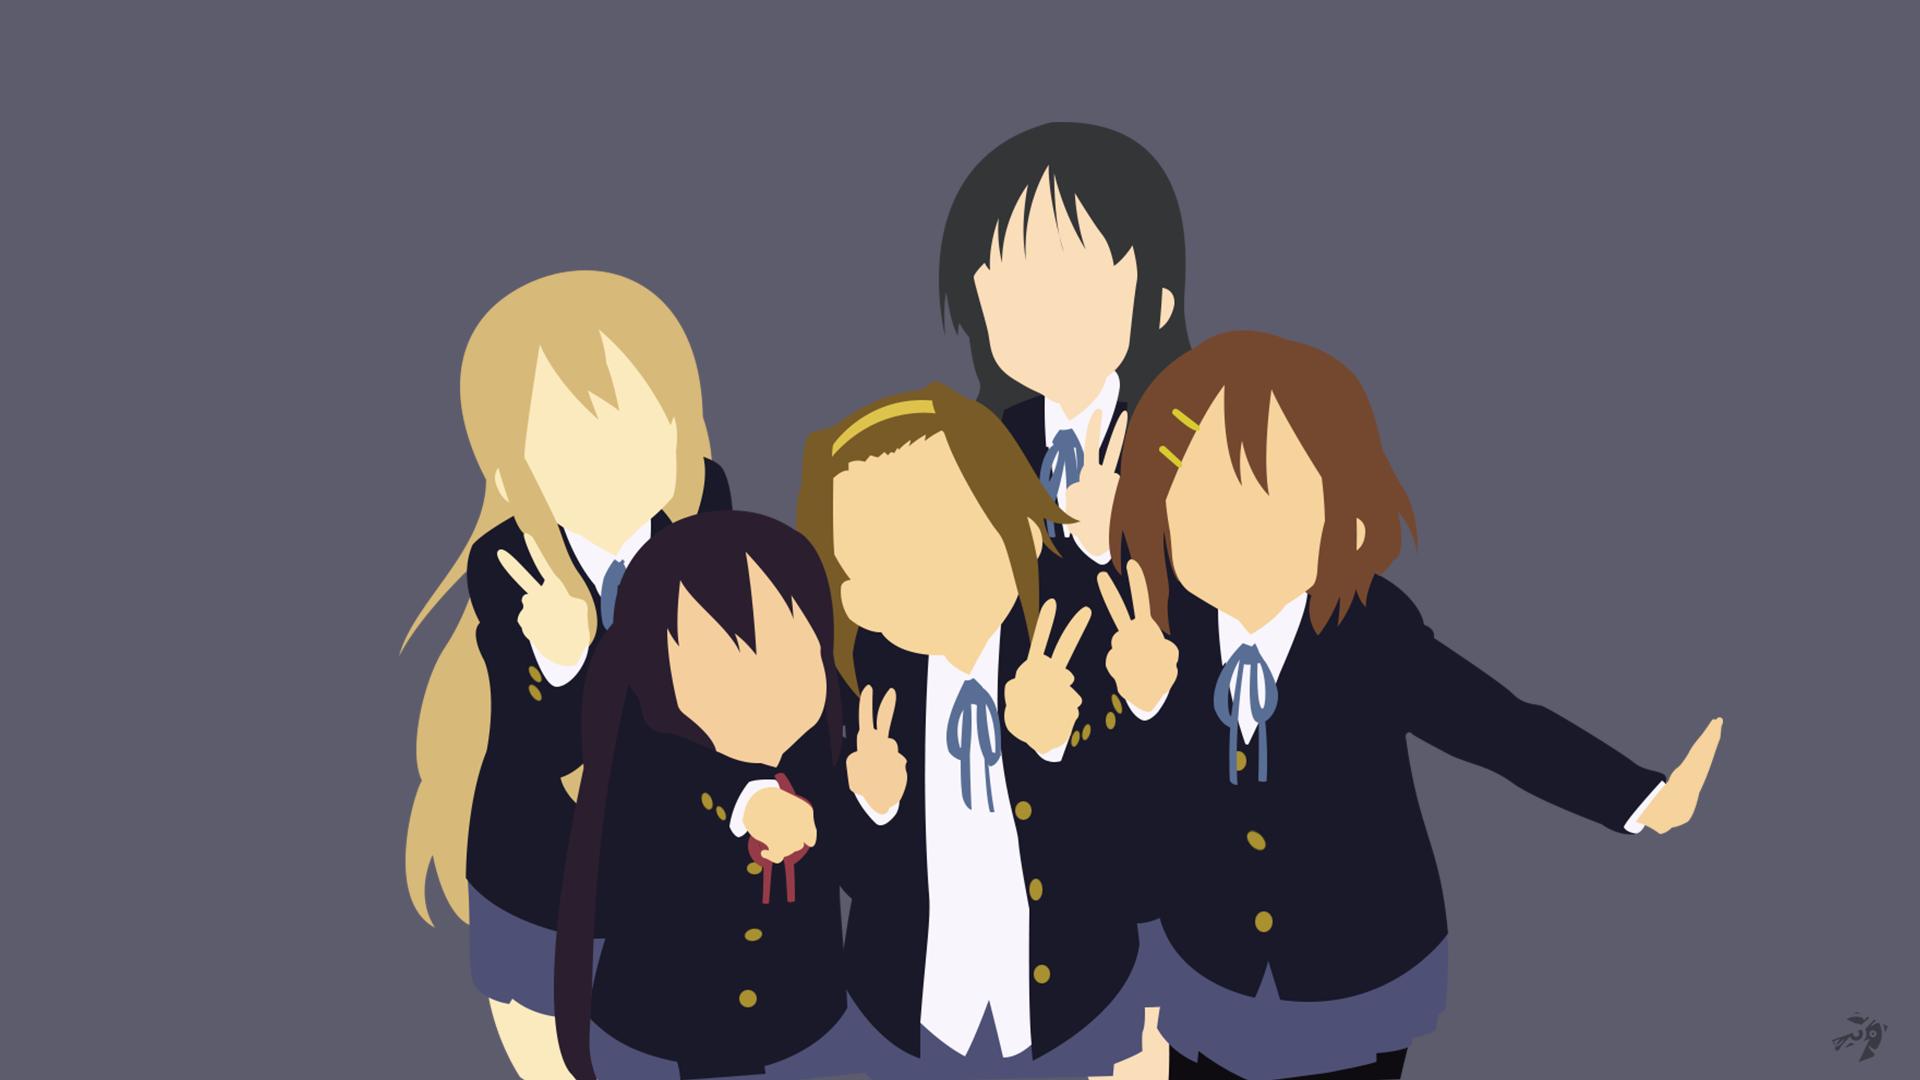 K On Minimalist Anime Wallpaper By Lucifer012 On Deviantart